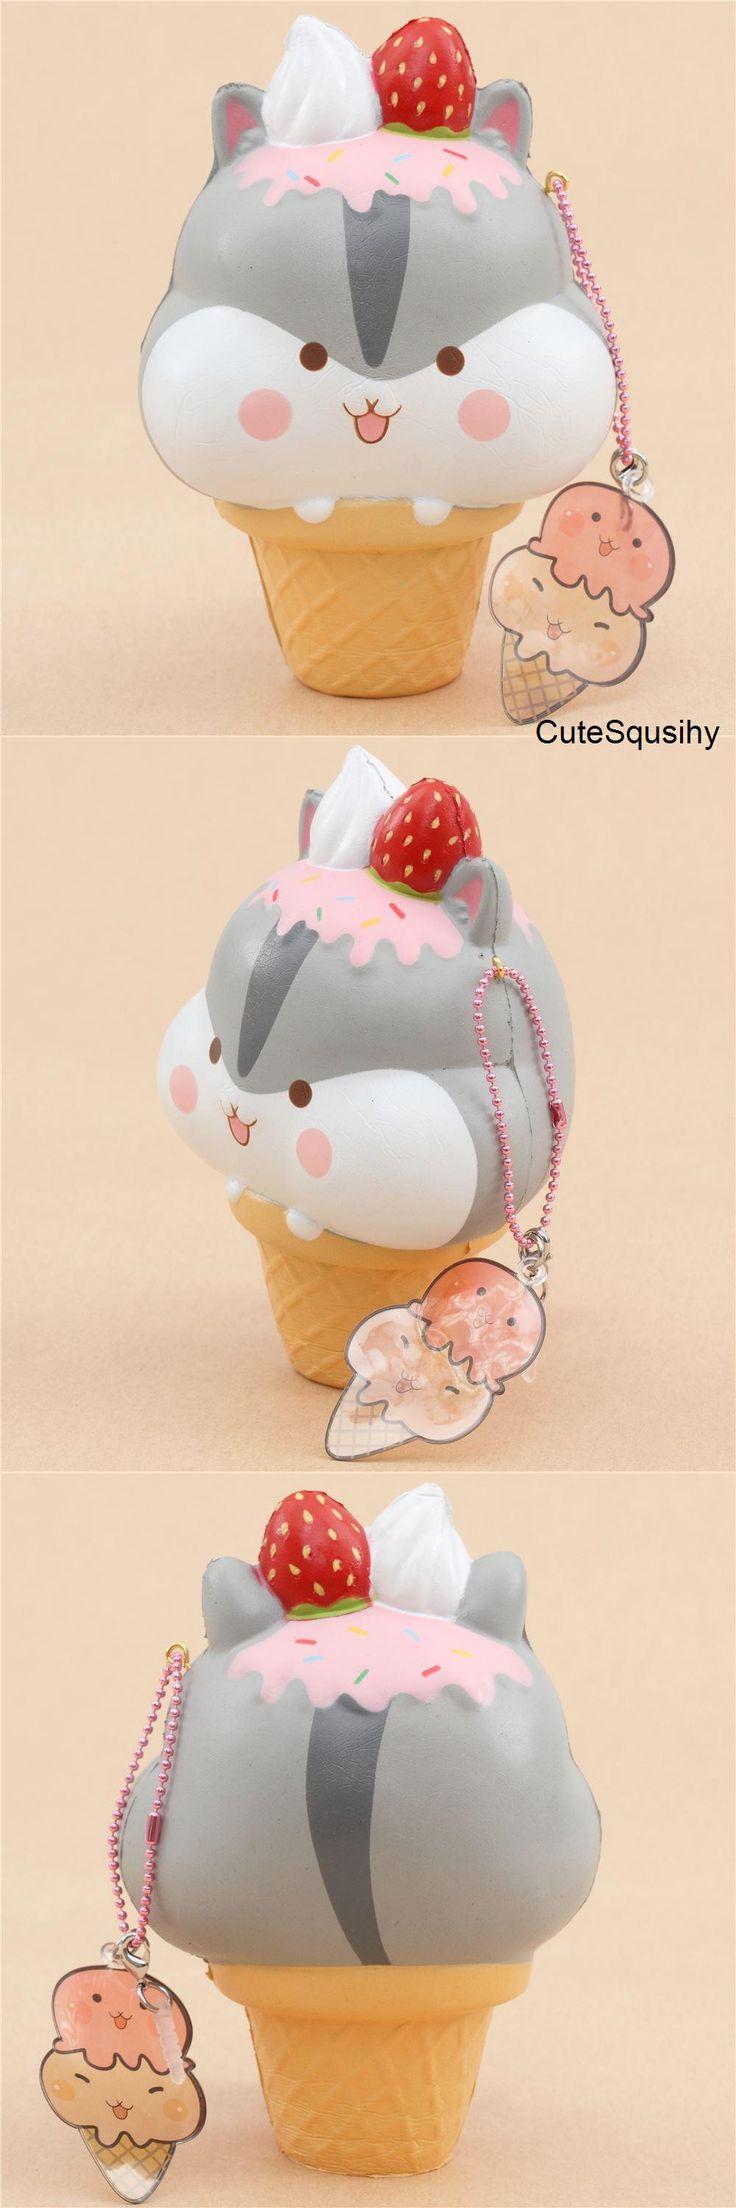 Kawaii Puni Maru strawberry dripping hampster ice cream cone squishy!